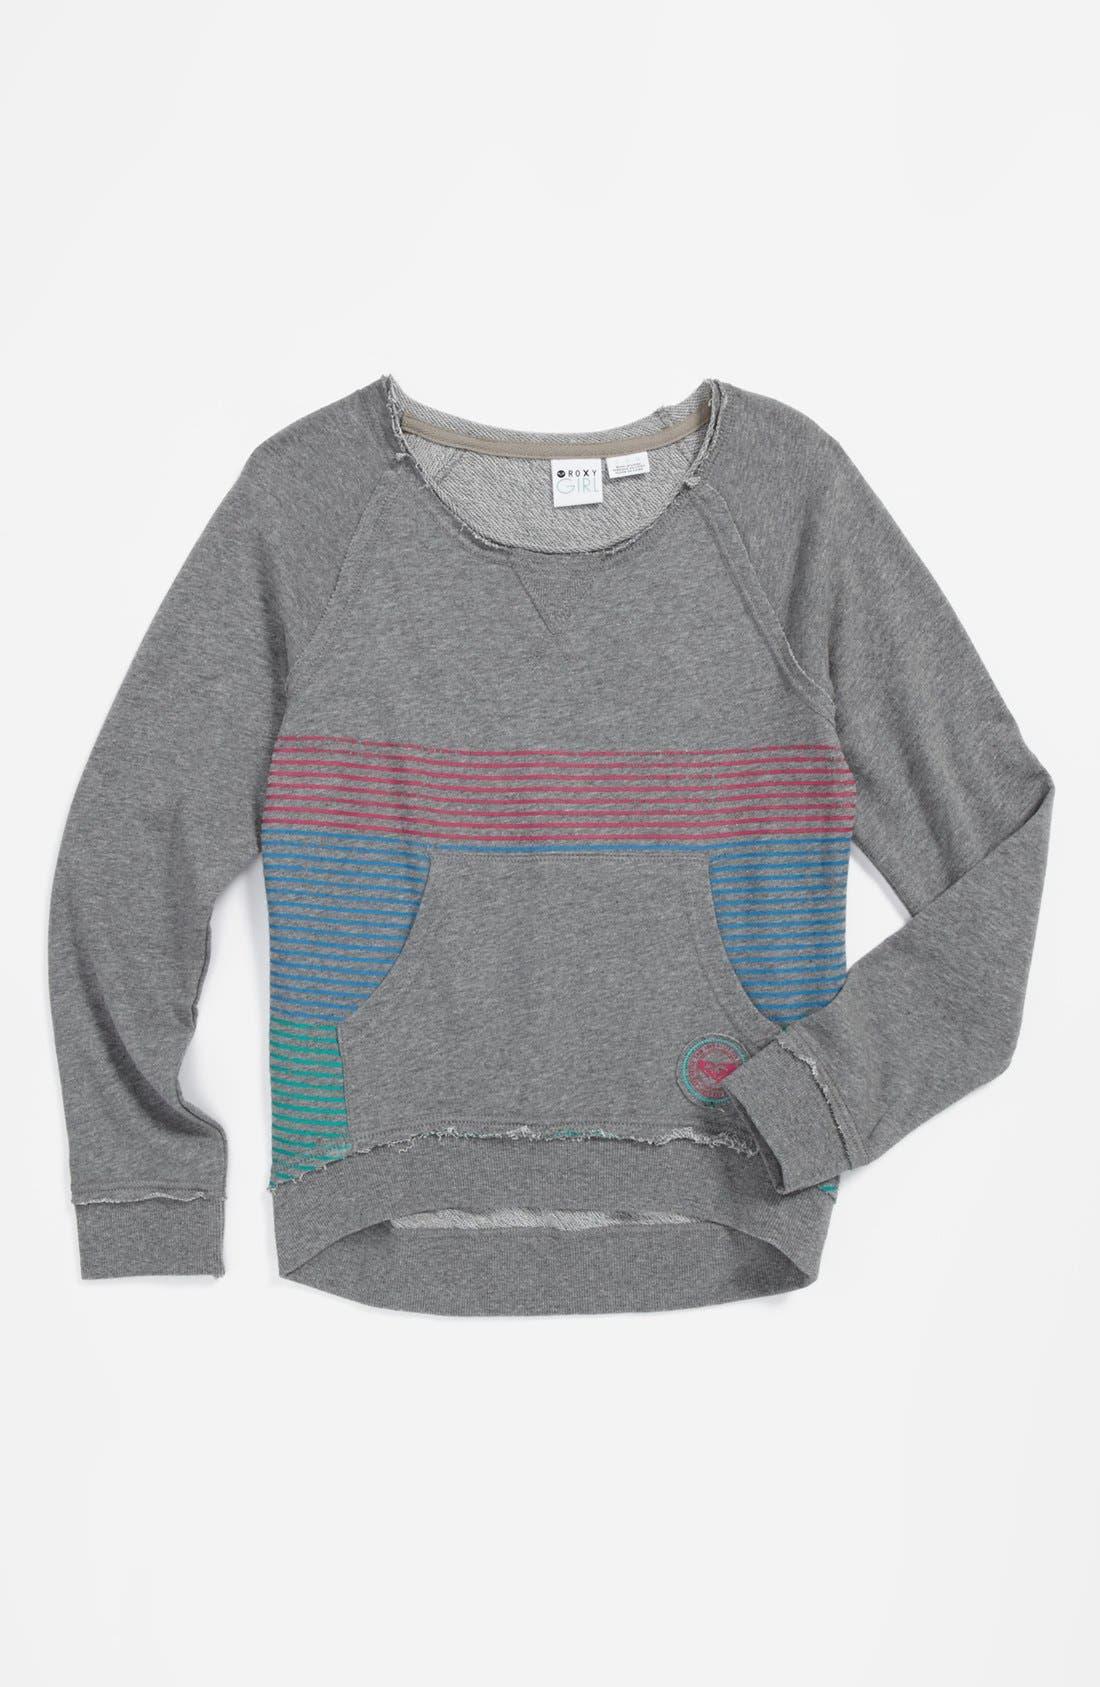 Alternate Image 1 Selected - 'Flicker' Sweatshirt (Big Girls)